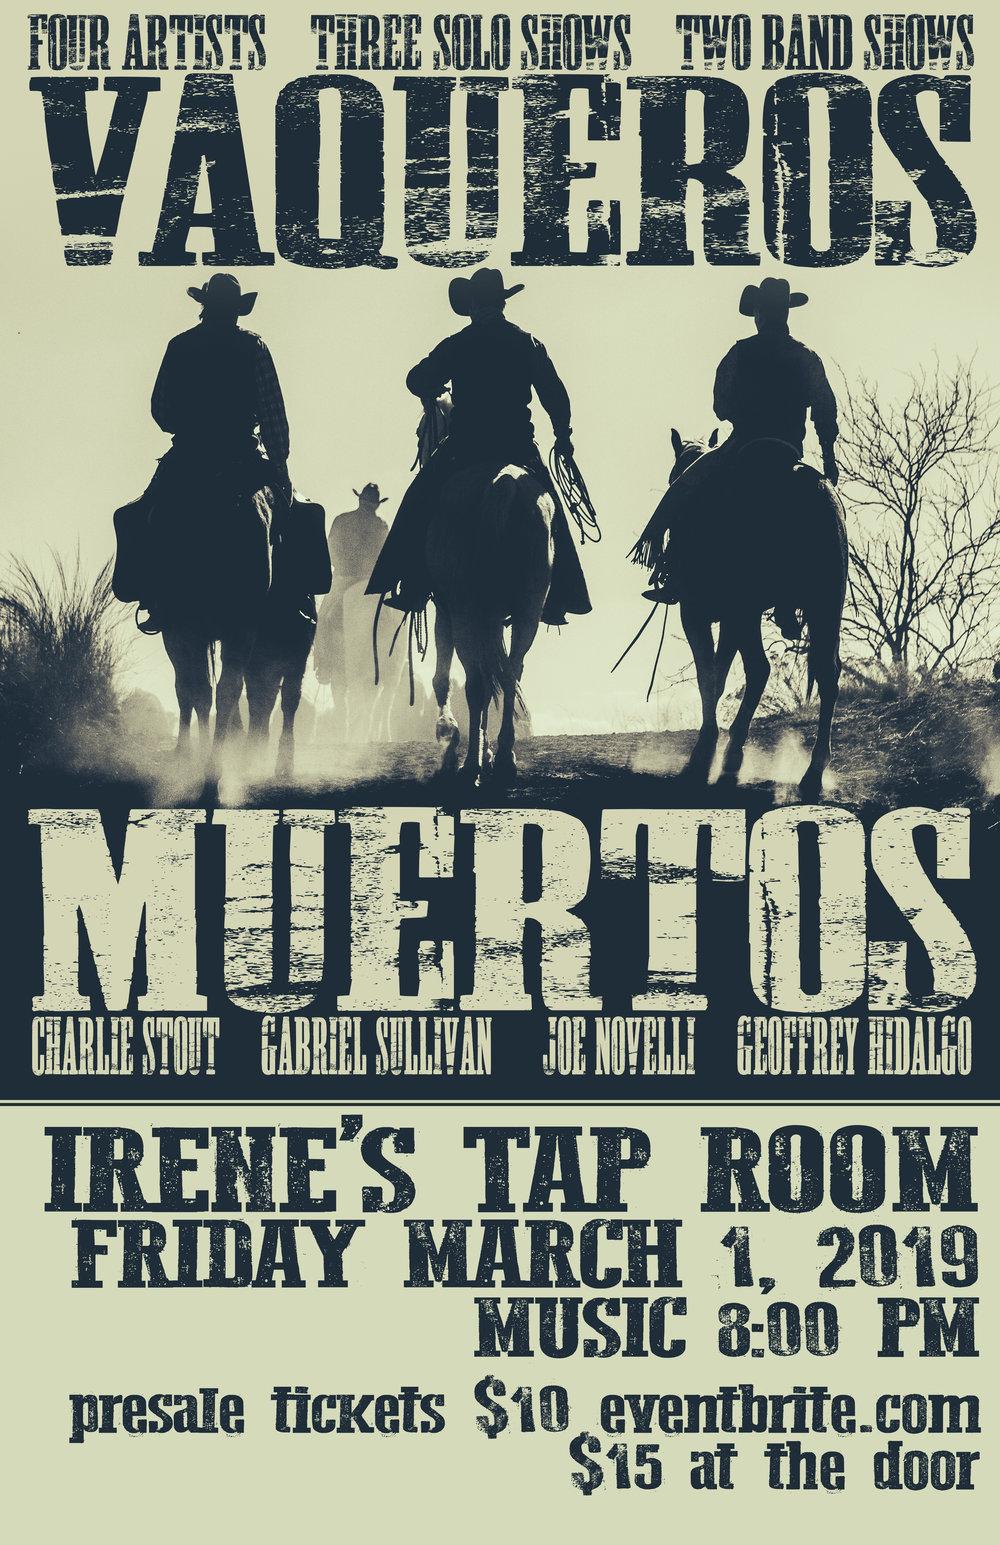 Vaqueros Muertos Poster 11x17.jpg